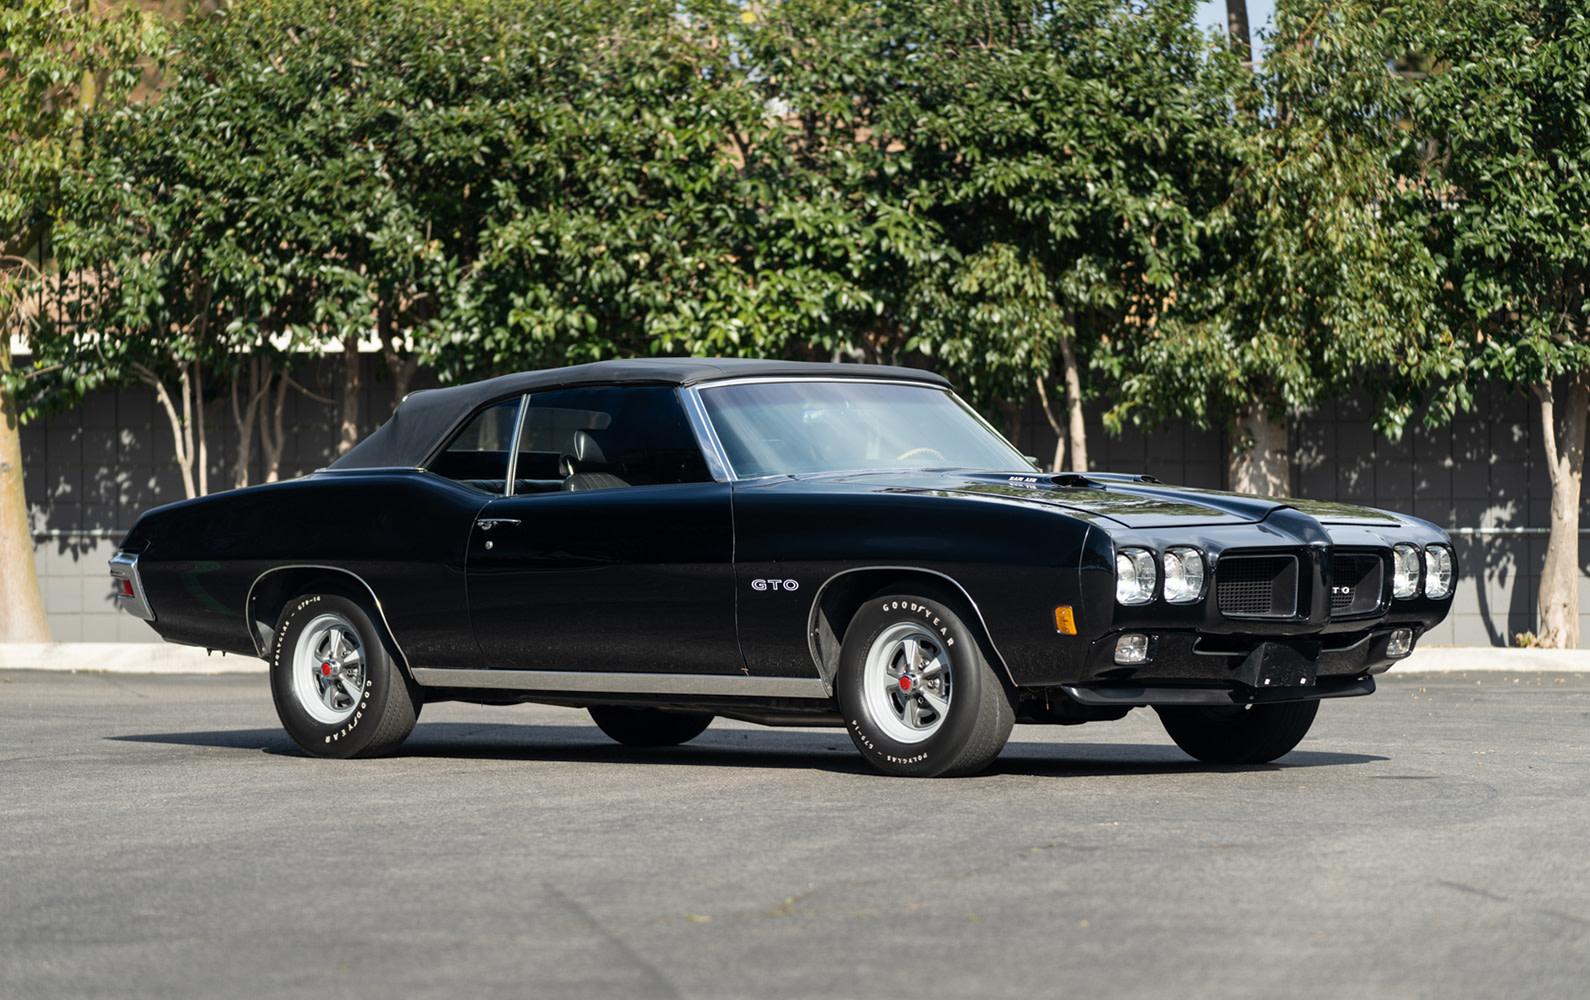 Prod/O21F - May 2021/1485_1970 Pontiac GTO Convertible/1970_Pontiac_GTO_Convertible_5_nvhsgh